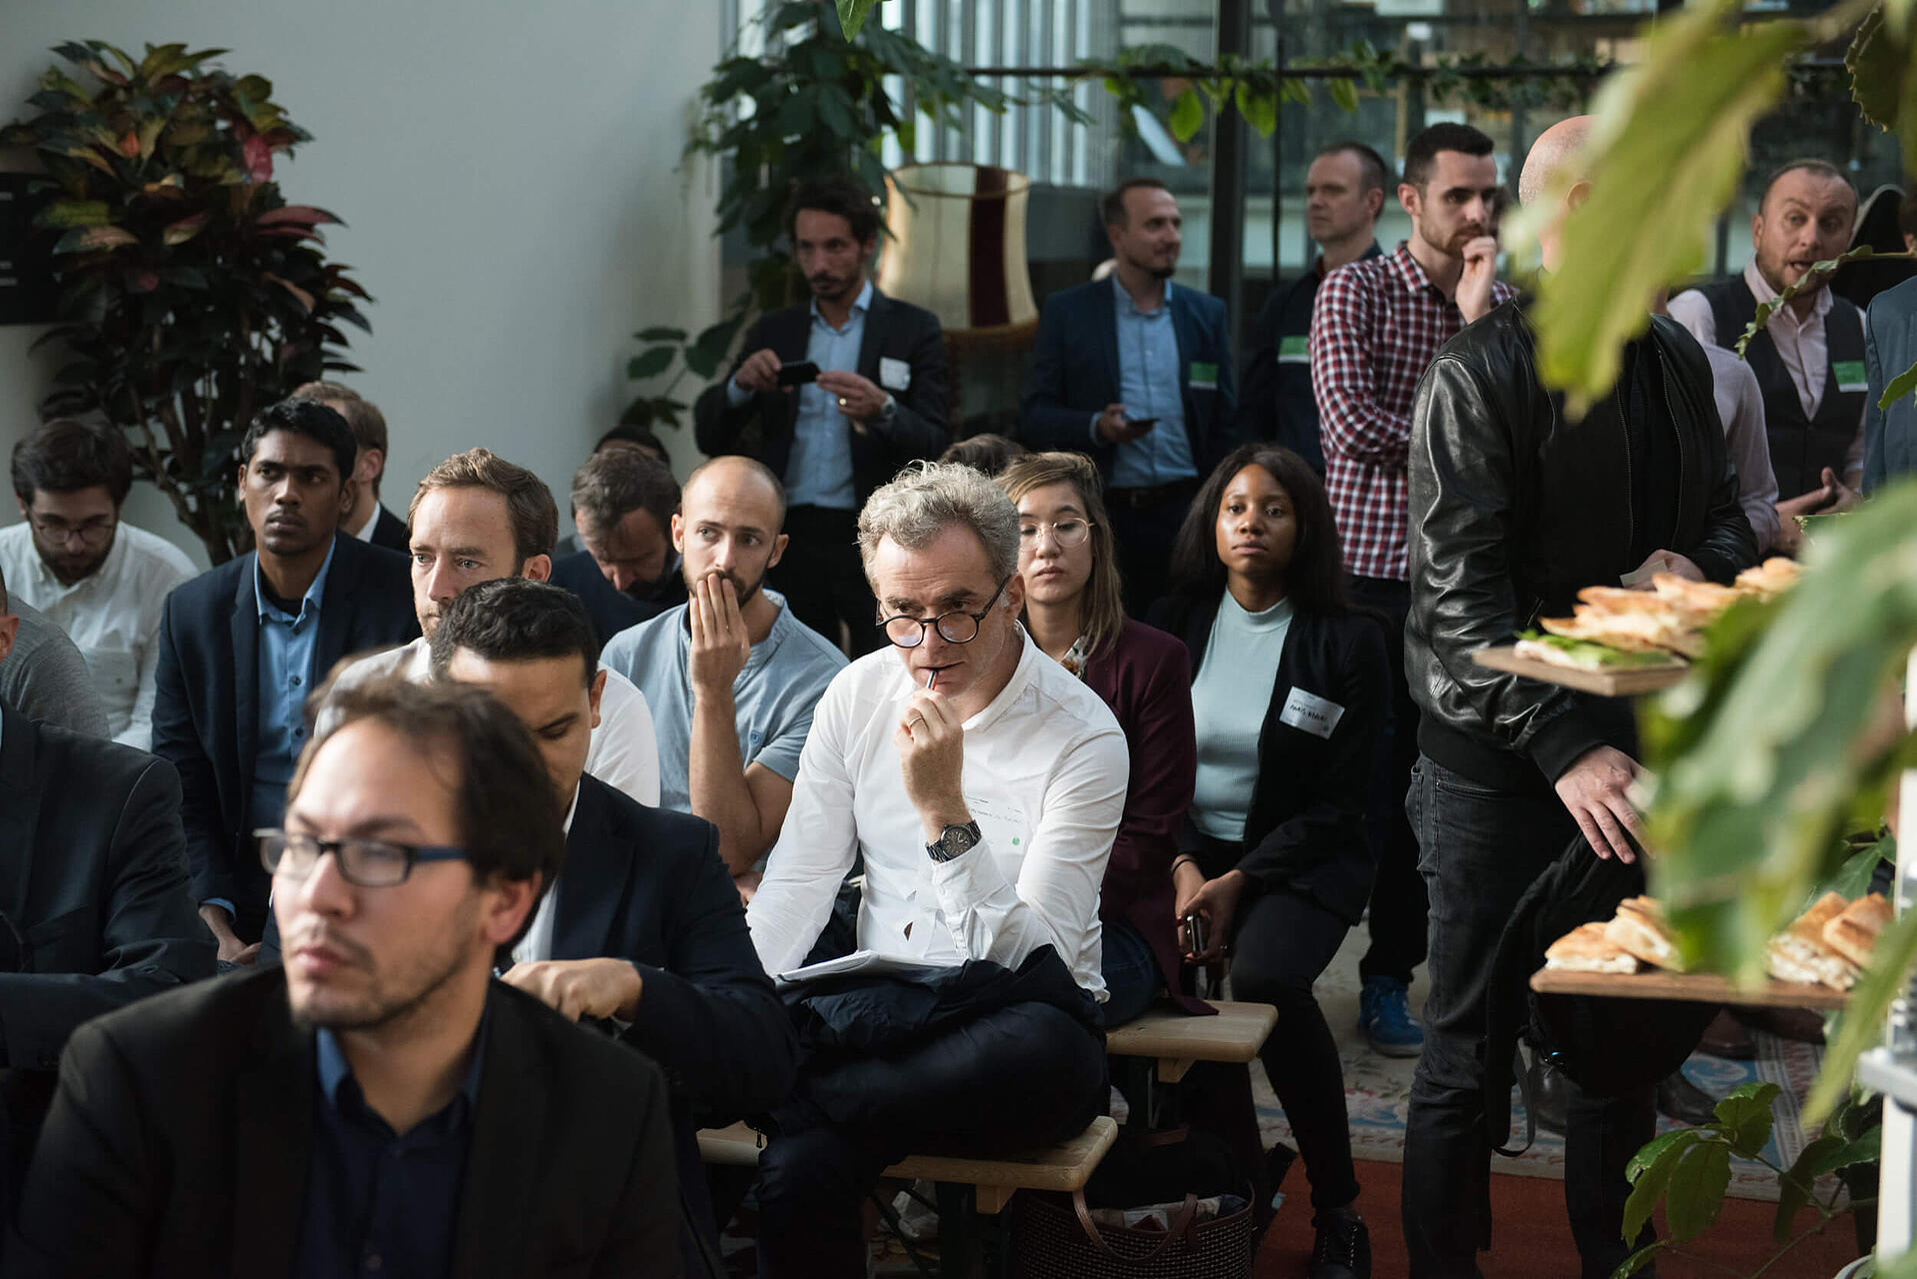 Disruption Forum events